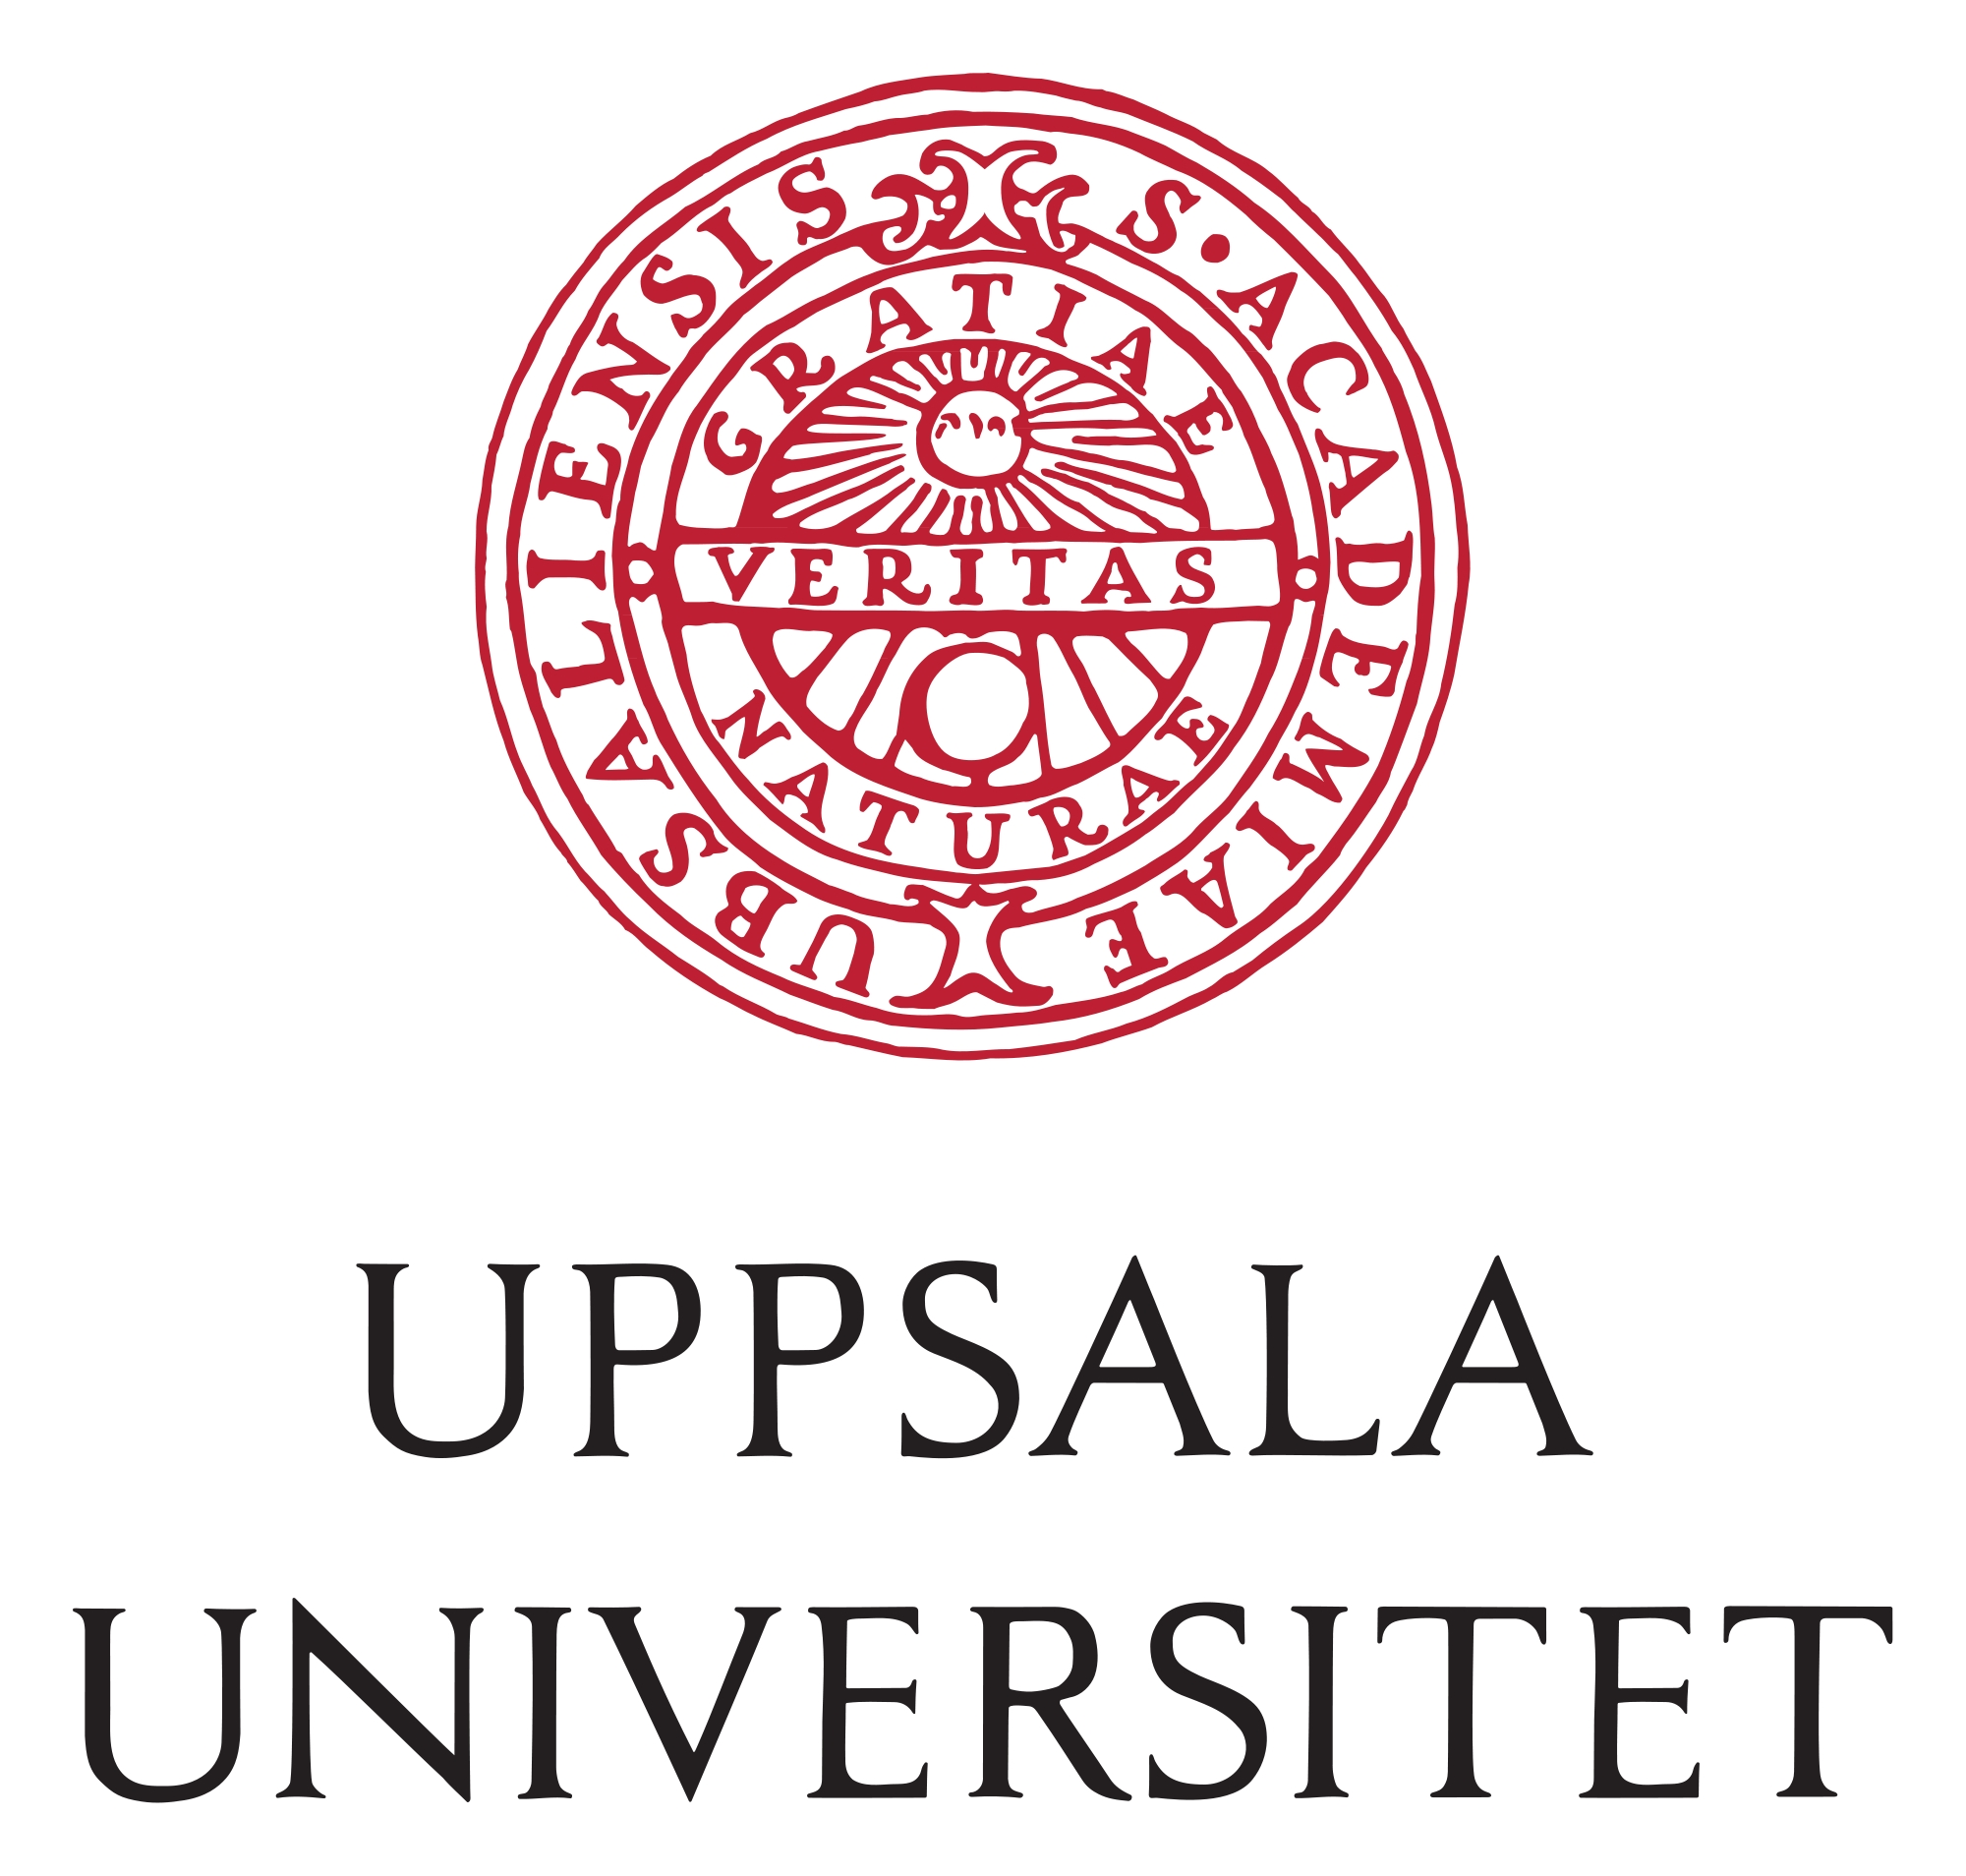 Om Uppsala Universitet